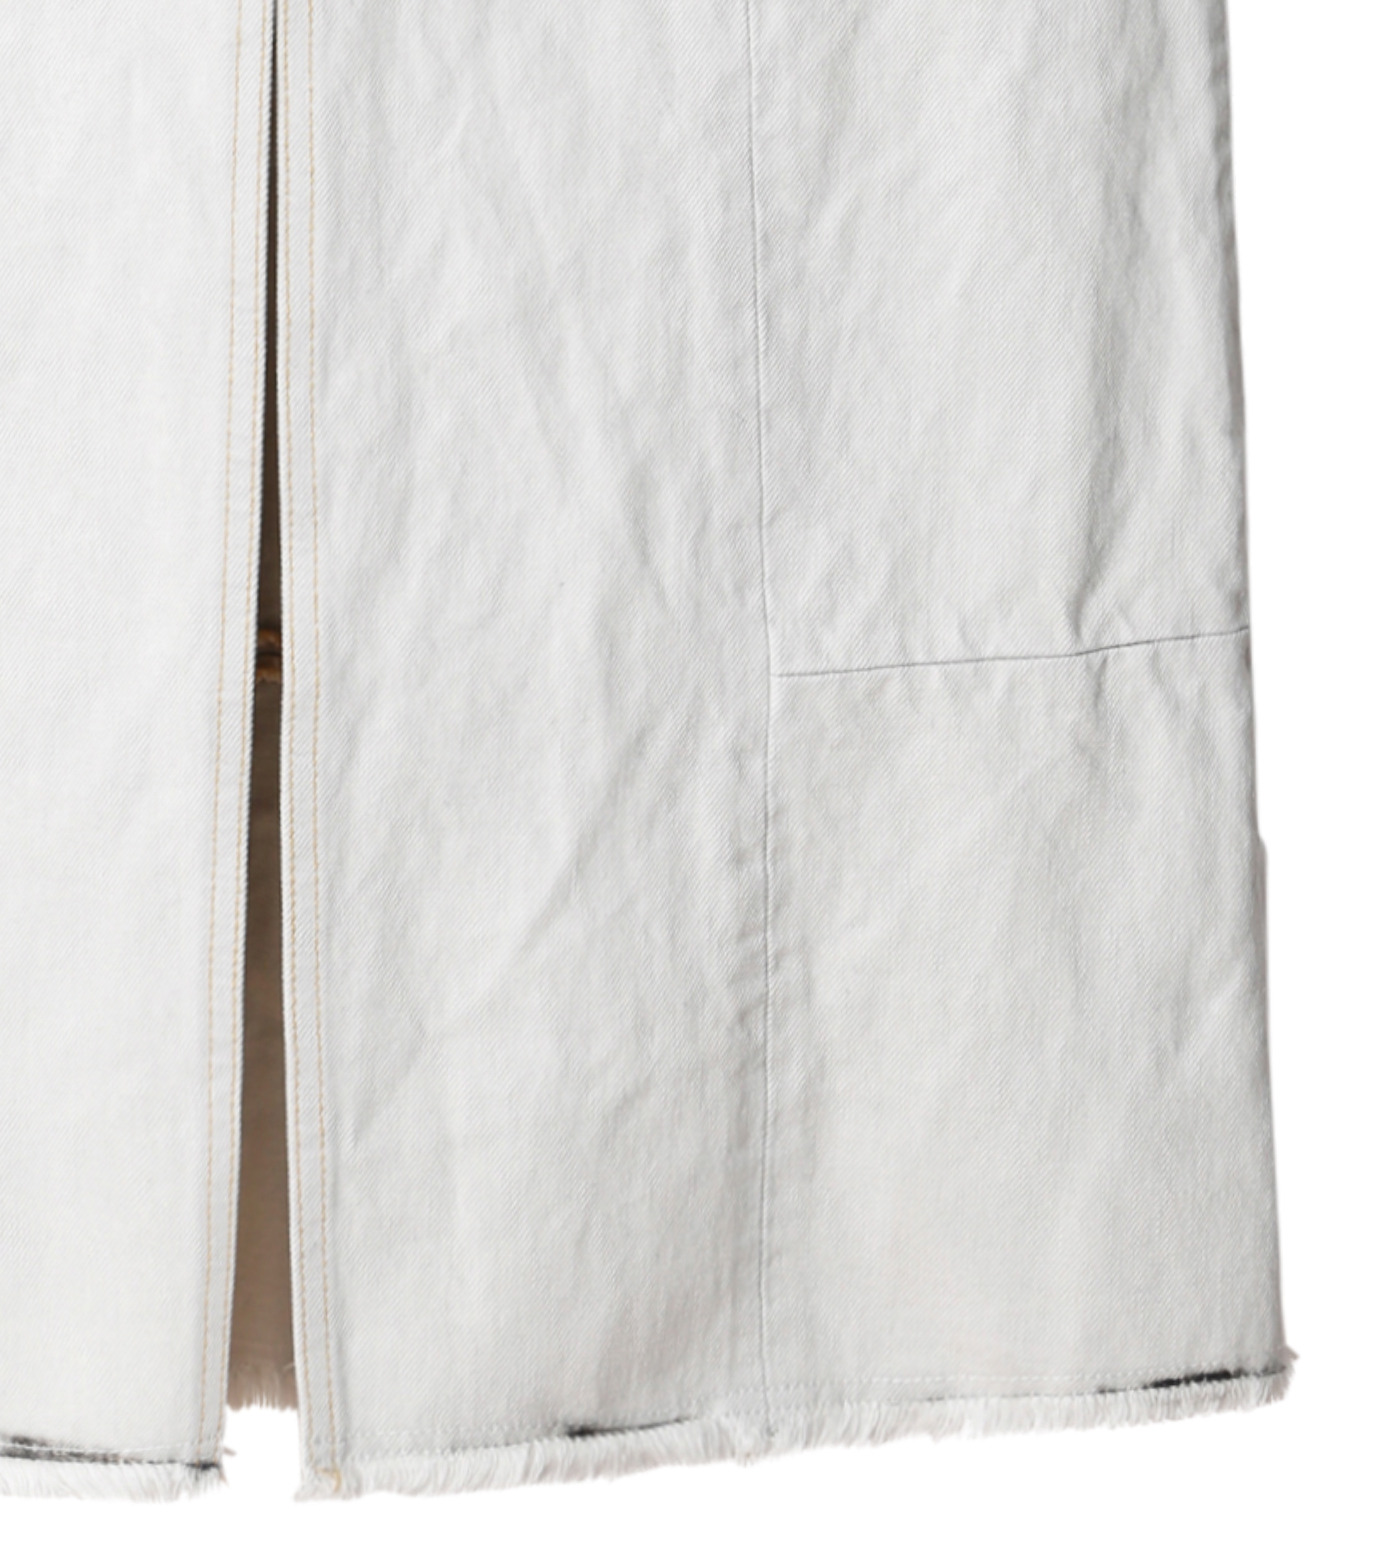 AKANE UTSUNOMIYA(アカネウツノミヤ)のDip Dye Denim Skirt-BLACK(スカート/skirt)-W16FSK383002-13 拡大詳細画像3